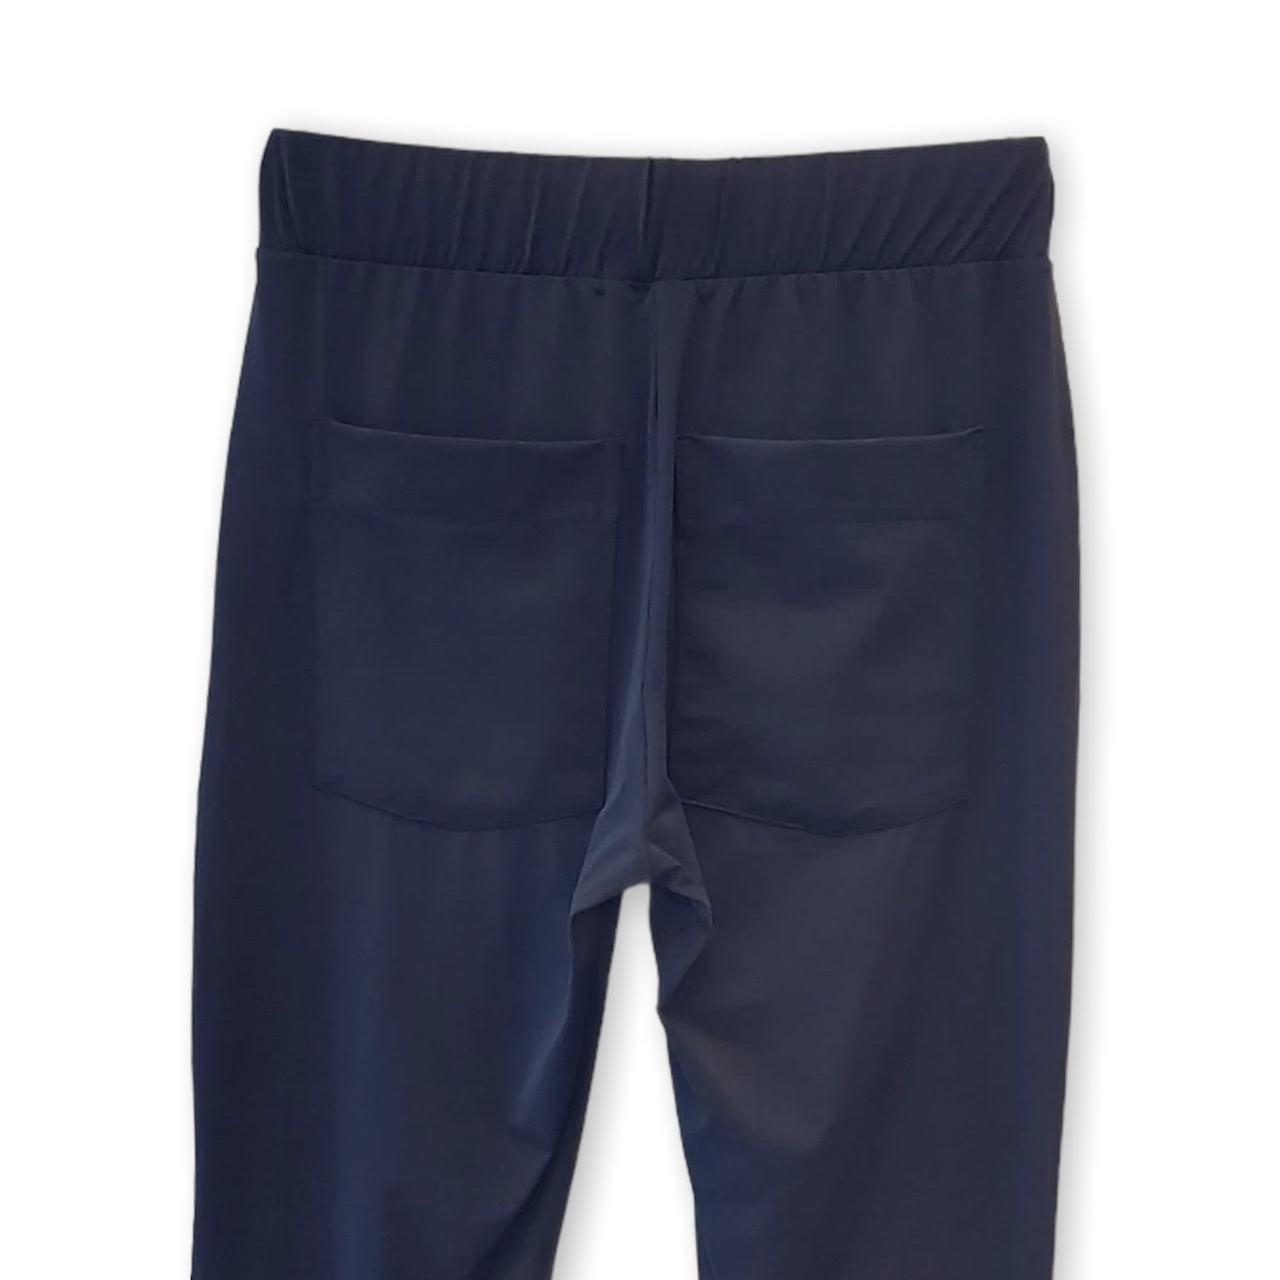 Calça Jogger Mayara azul marinho